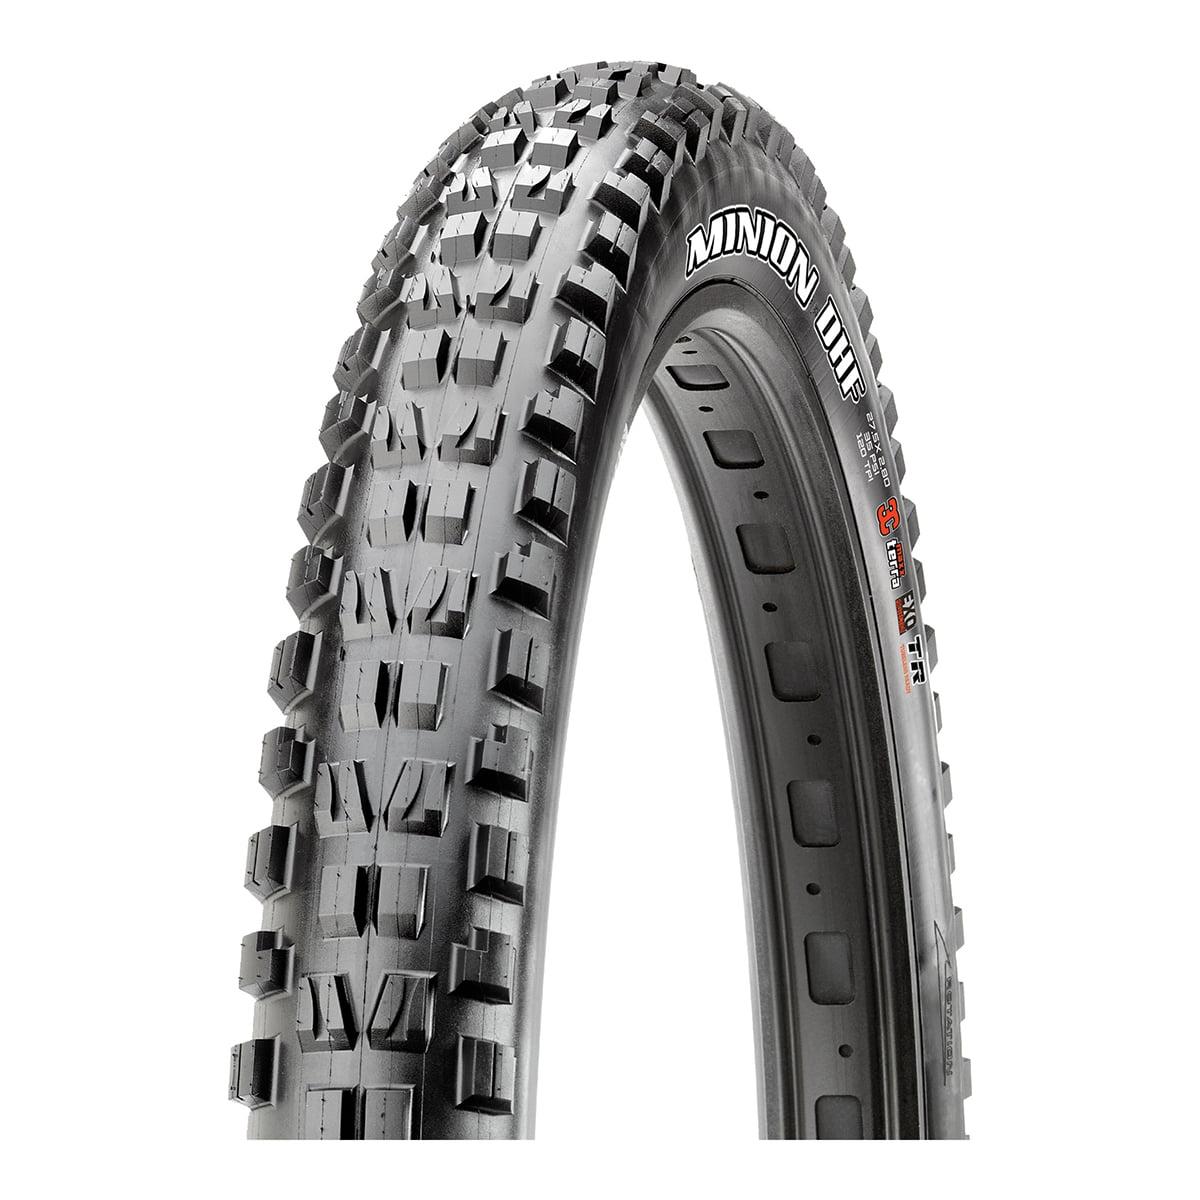 "Maxxis Minion DHF 27.5x2.80"" Tire 120tpi, 3C Maxx Terra Compound, EXO Casing, Tubeless Ready, Black"